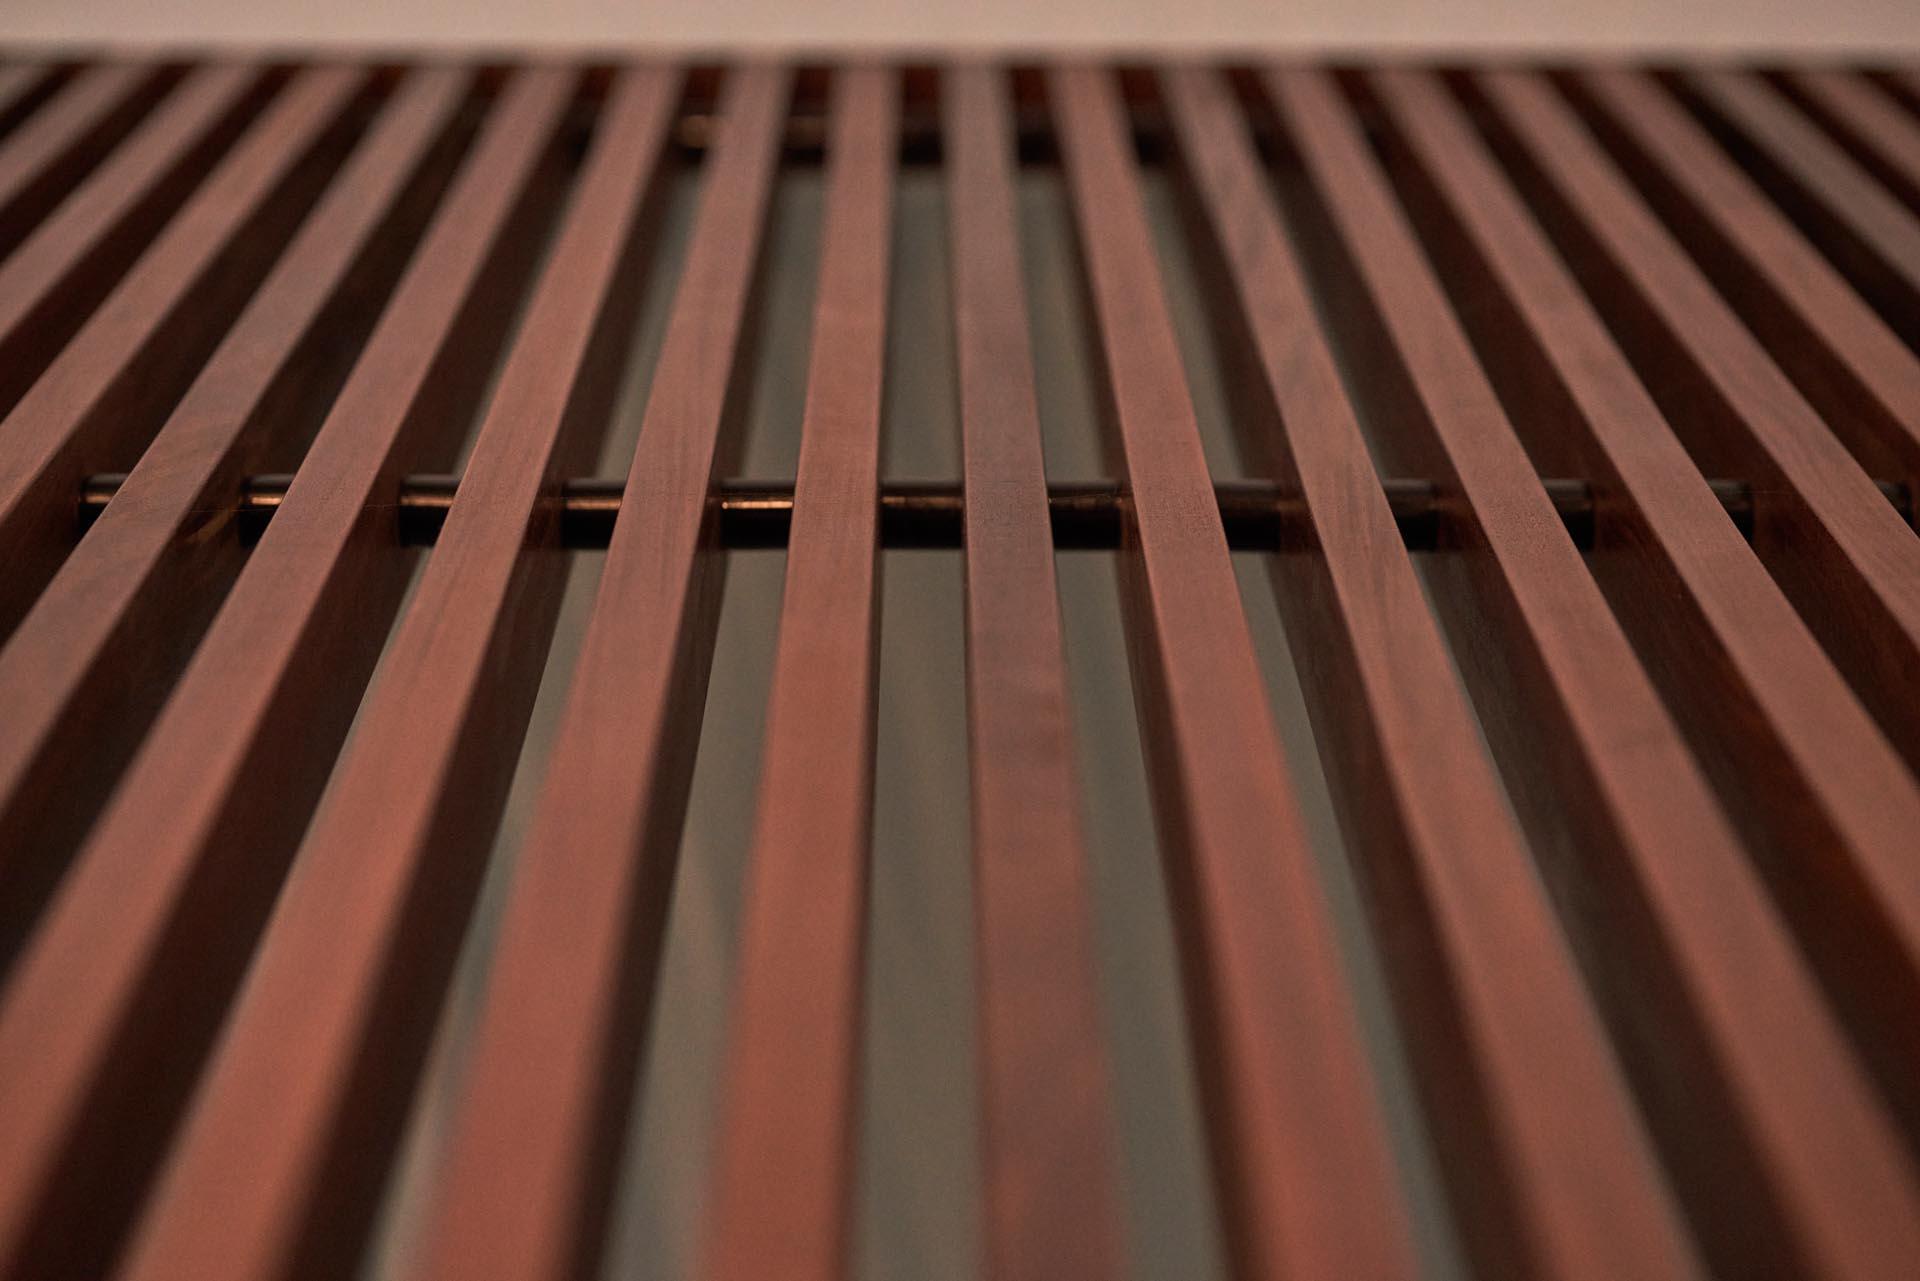 A closeup look at a wood slat wall.